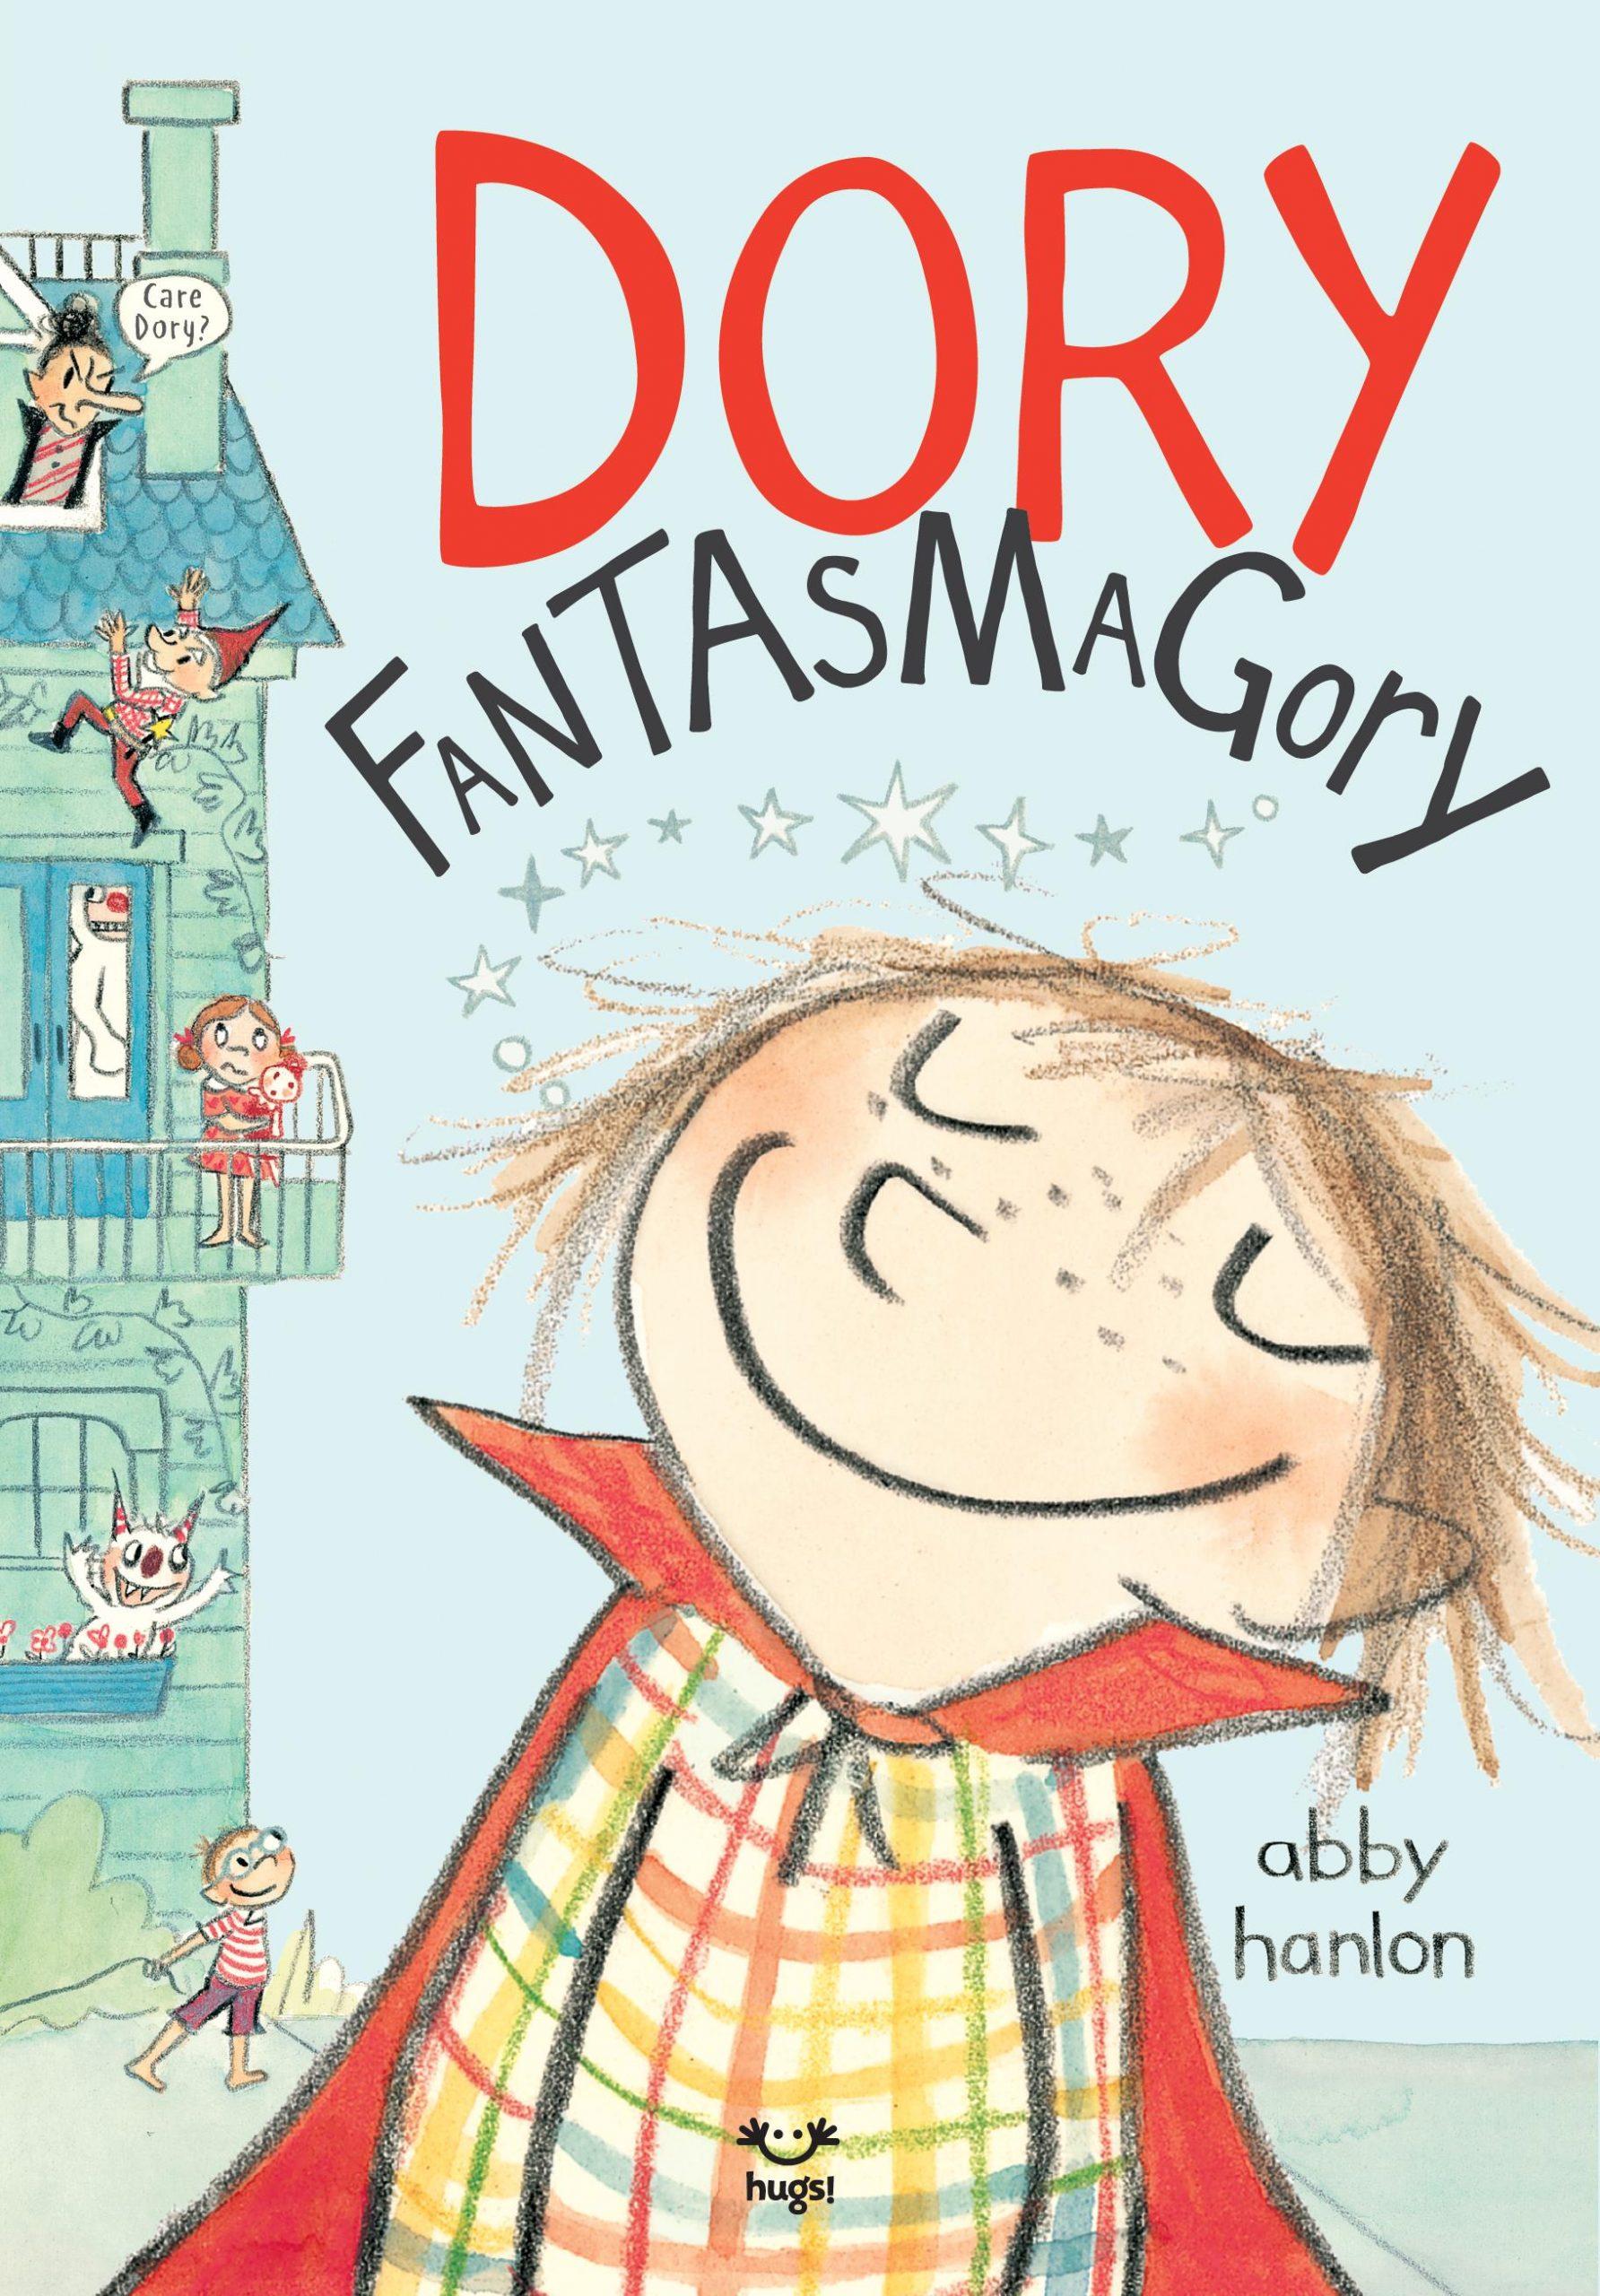 Dory Fantasmagory (vol. 1)